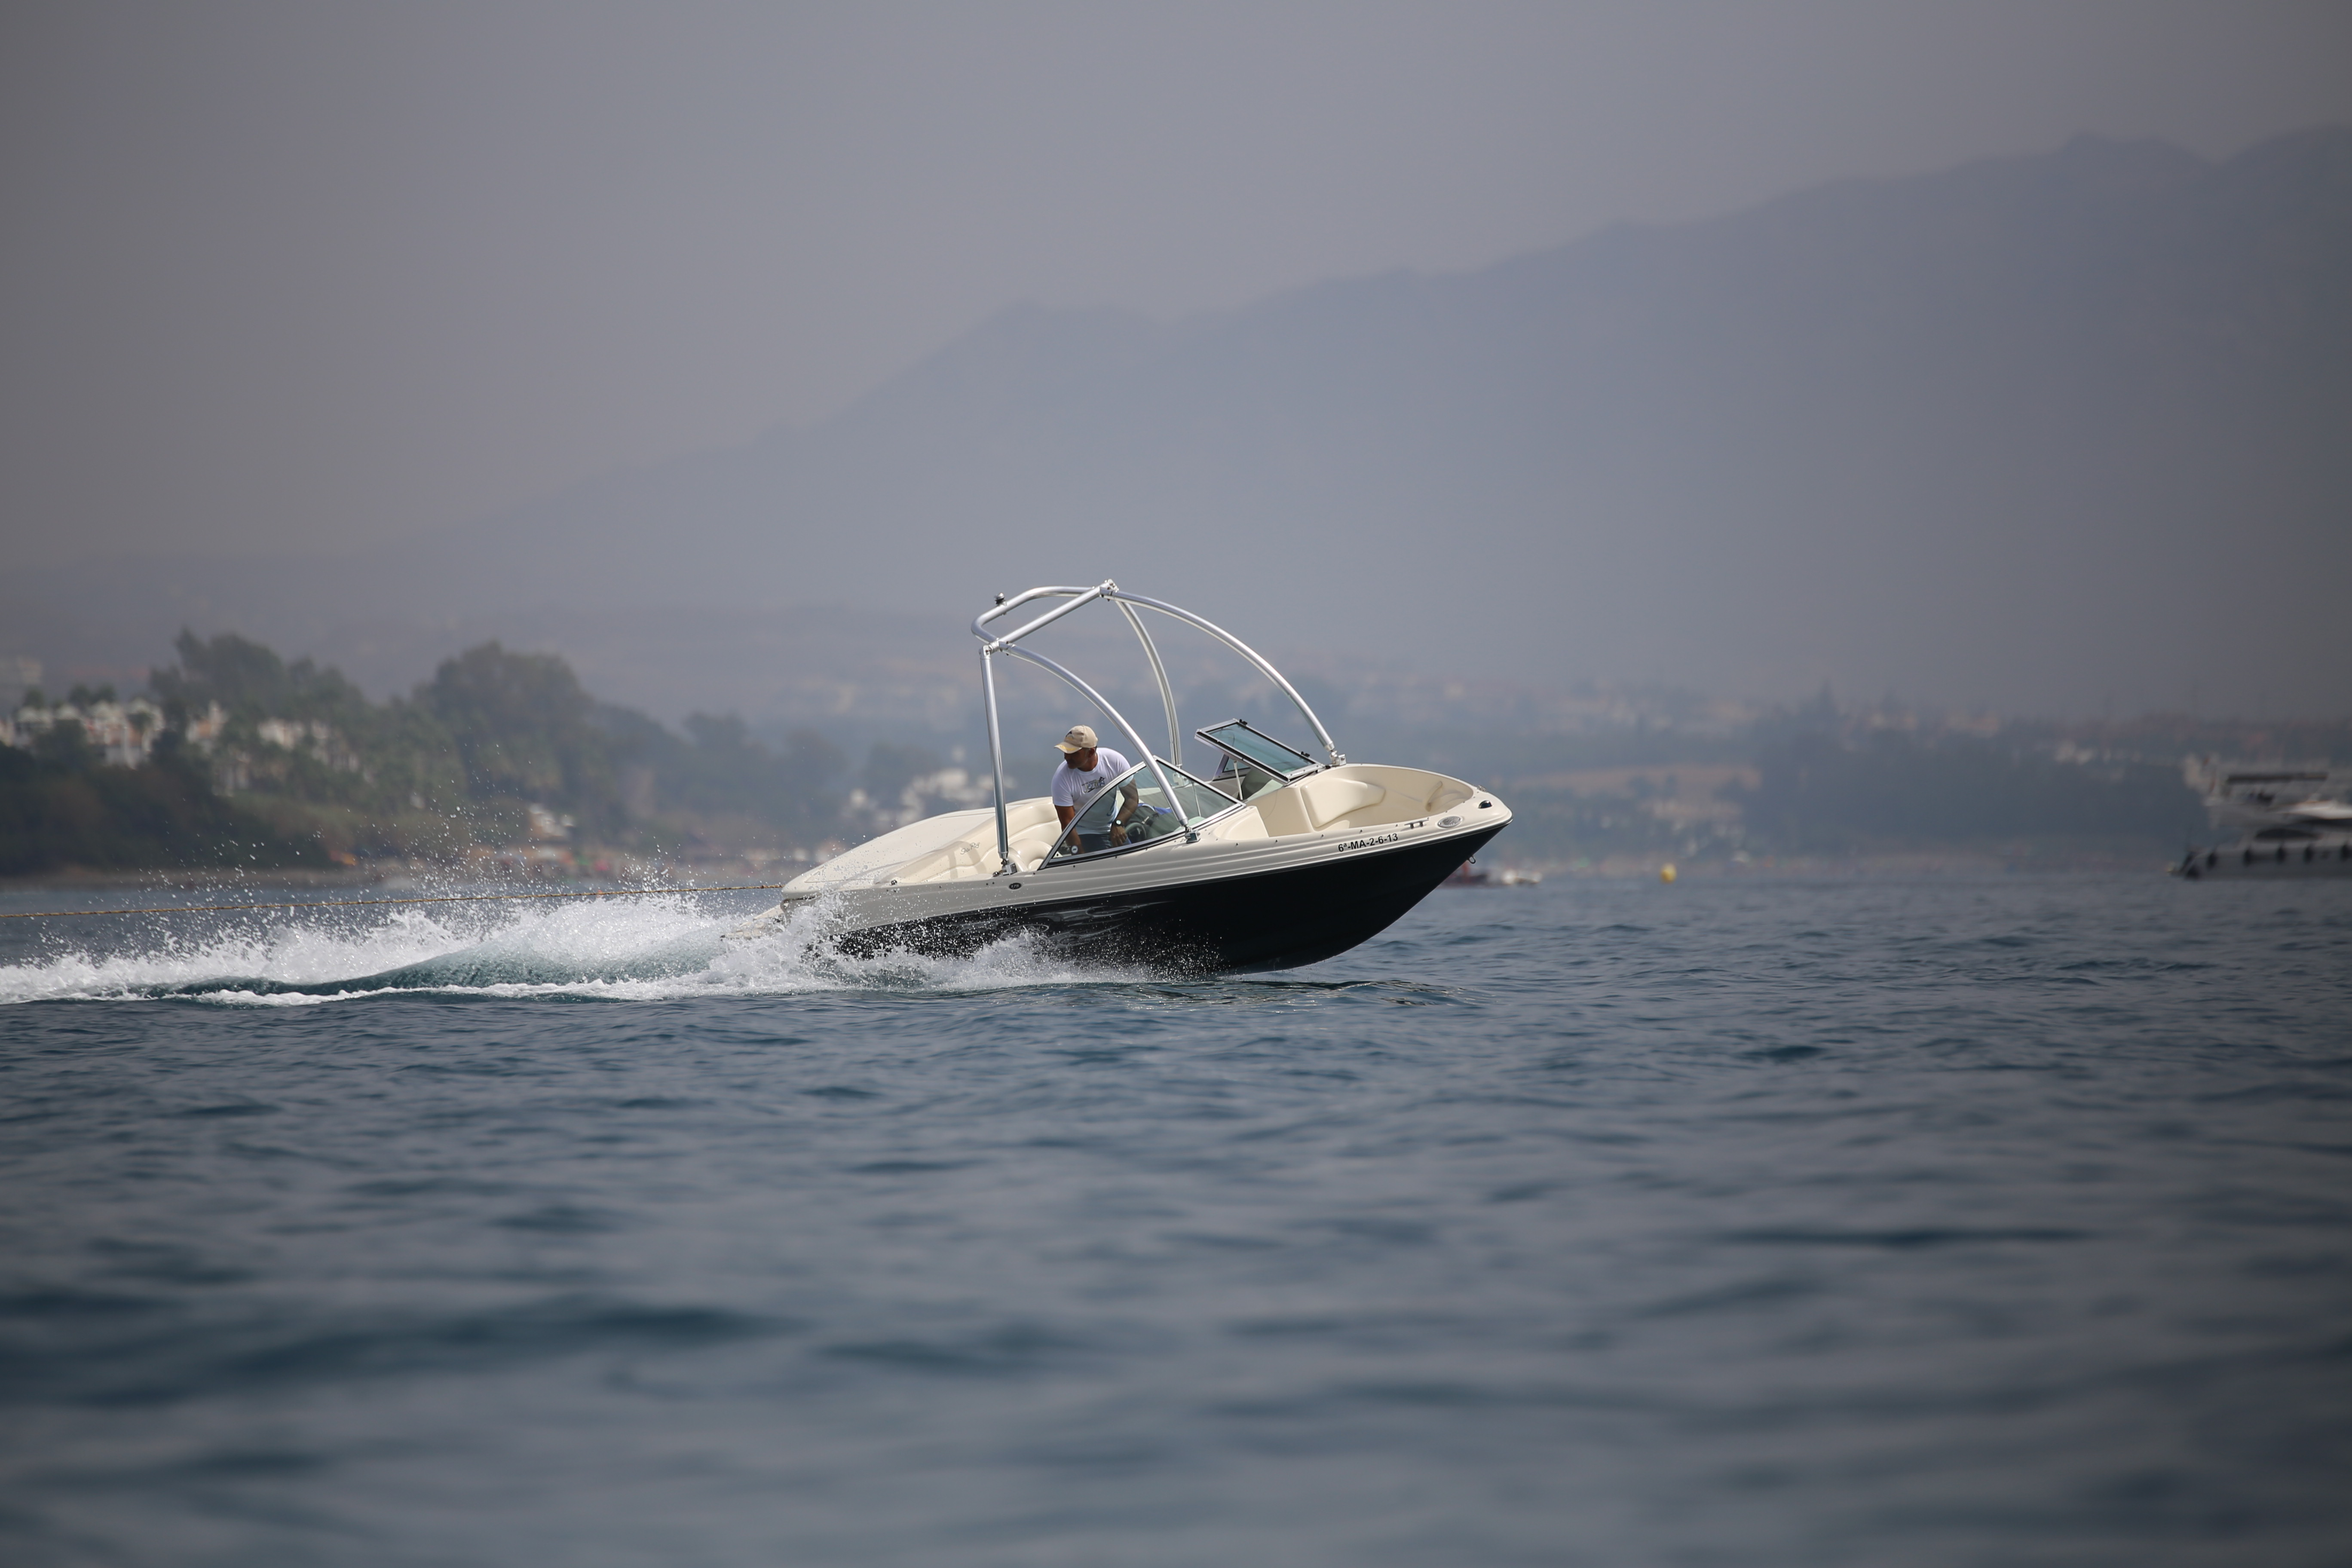 Alquilar barco en Estepona